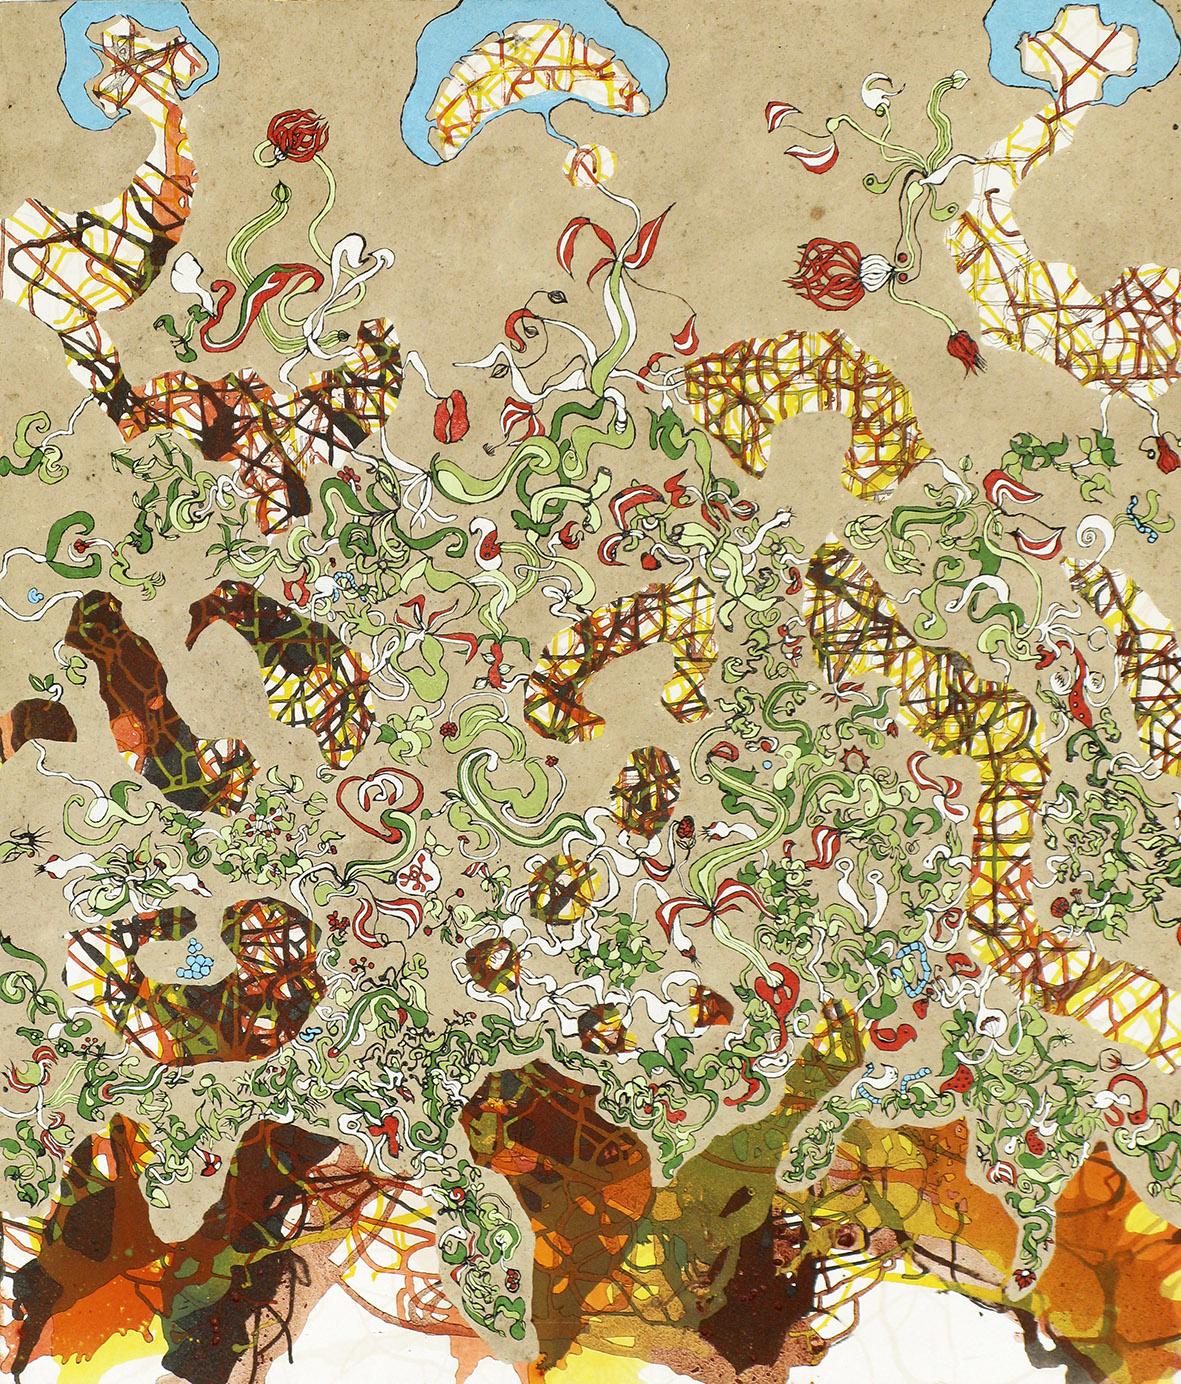 patrick-altes-the-hanging-gardens-of-babylon-2